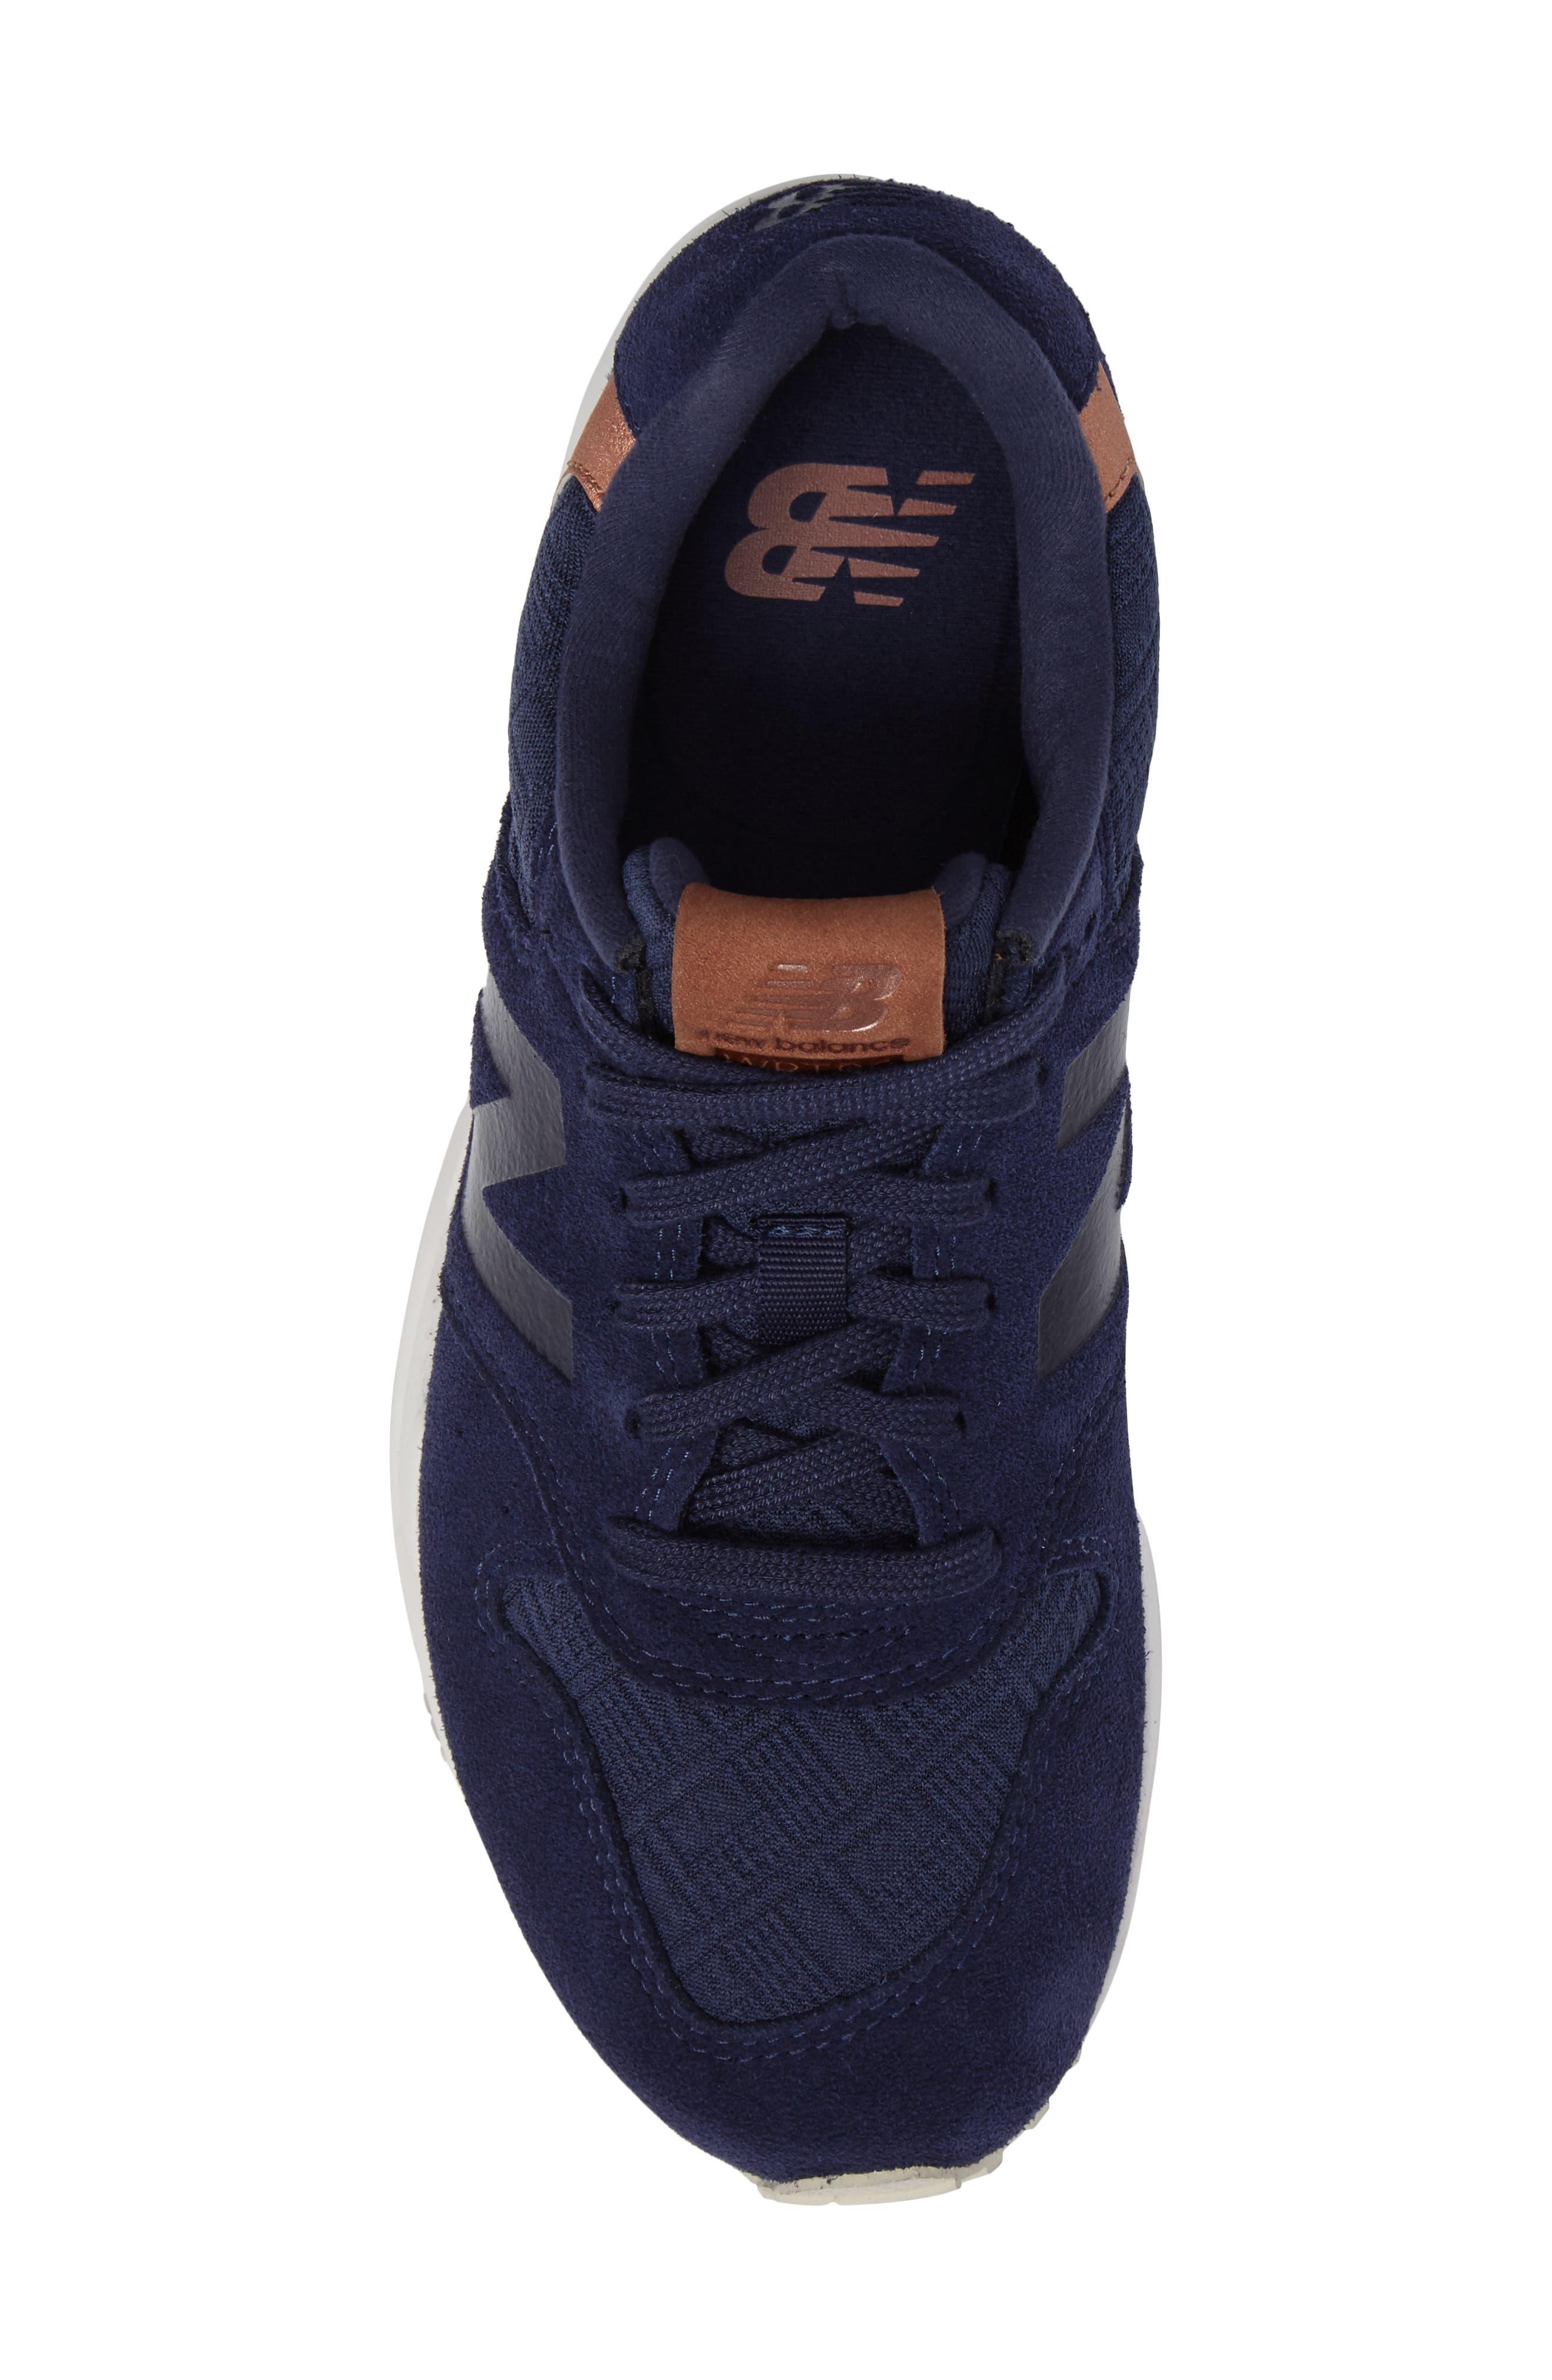 96 Mash-Up Sneaker,                             Alternate thumbnail 30, color,